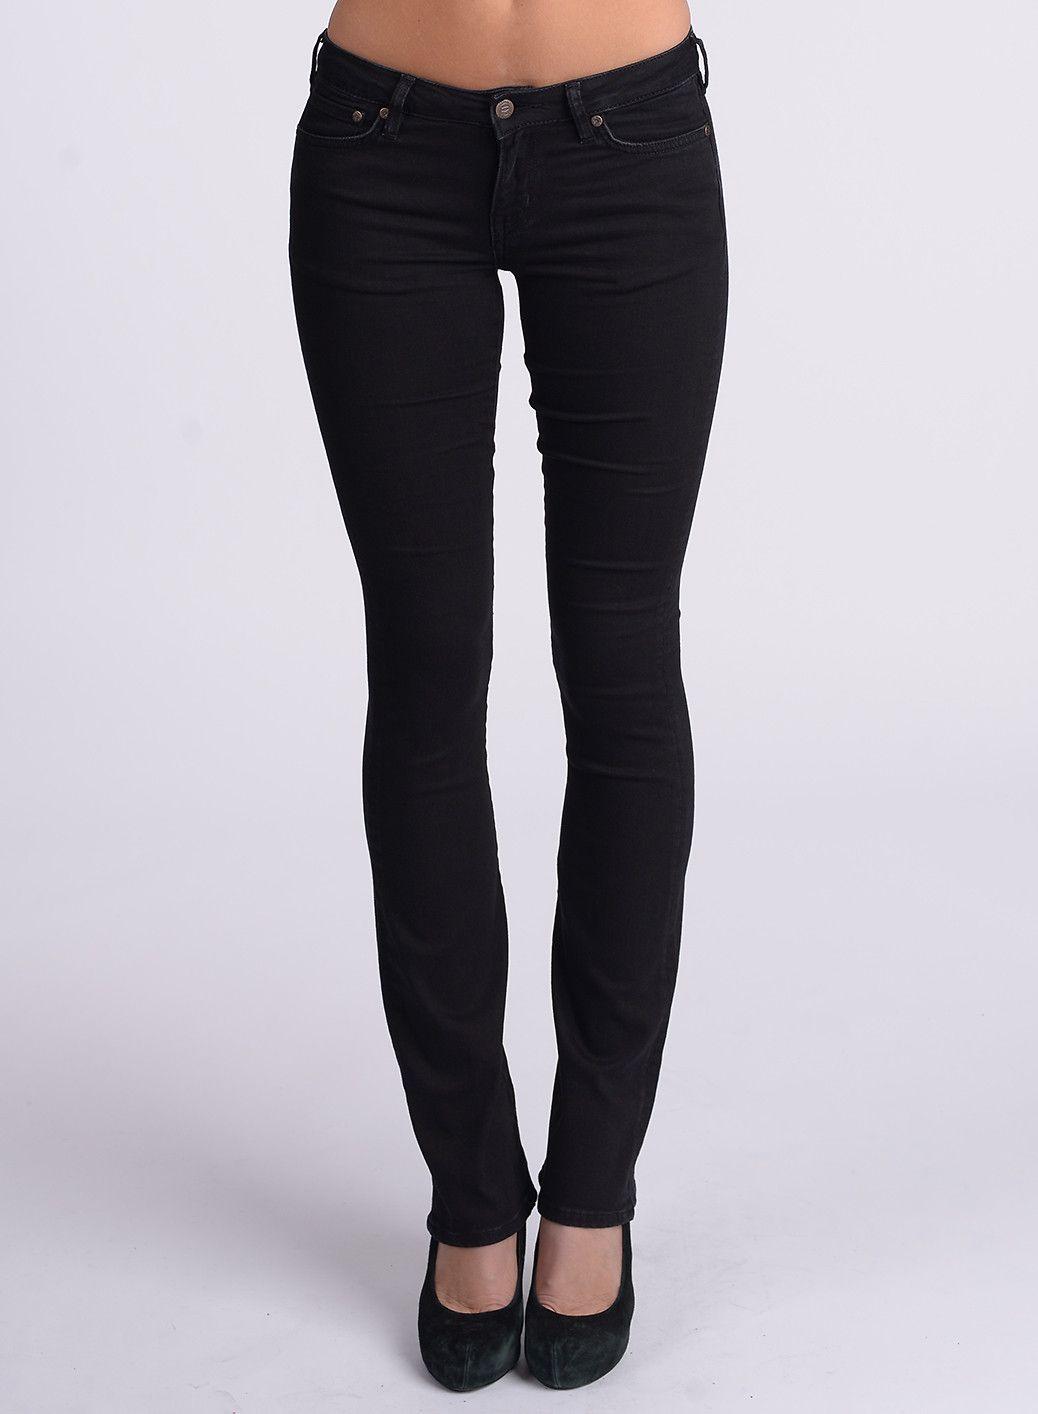 8cface859818 Shoppa Tjej | Underdelar | Jeans | JC.se - JC - Jeans Company ...